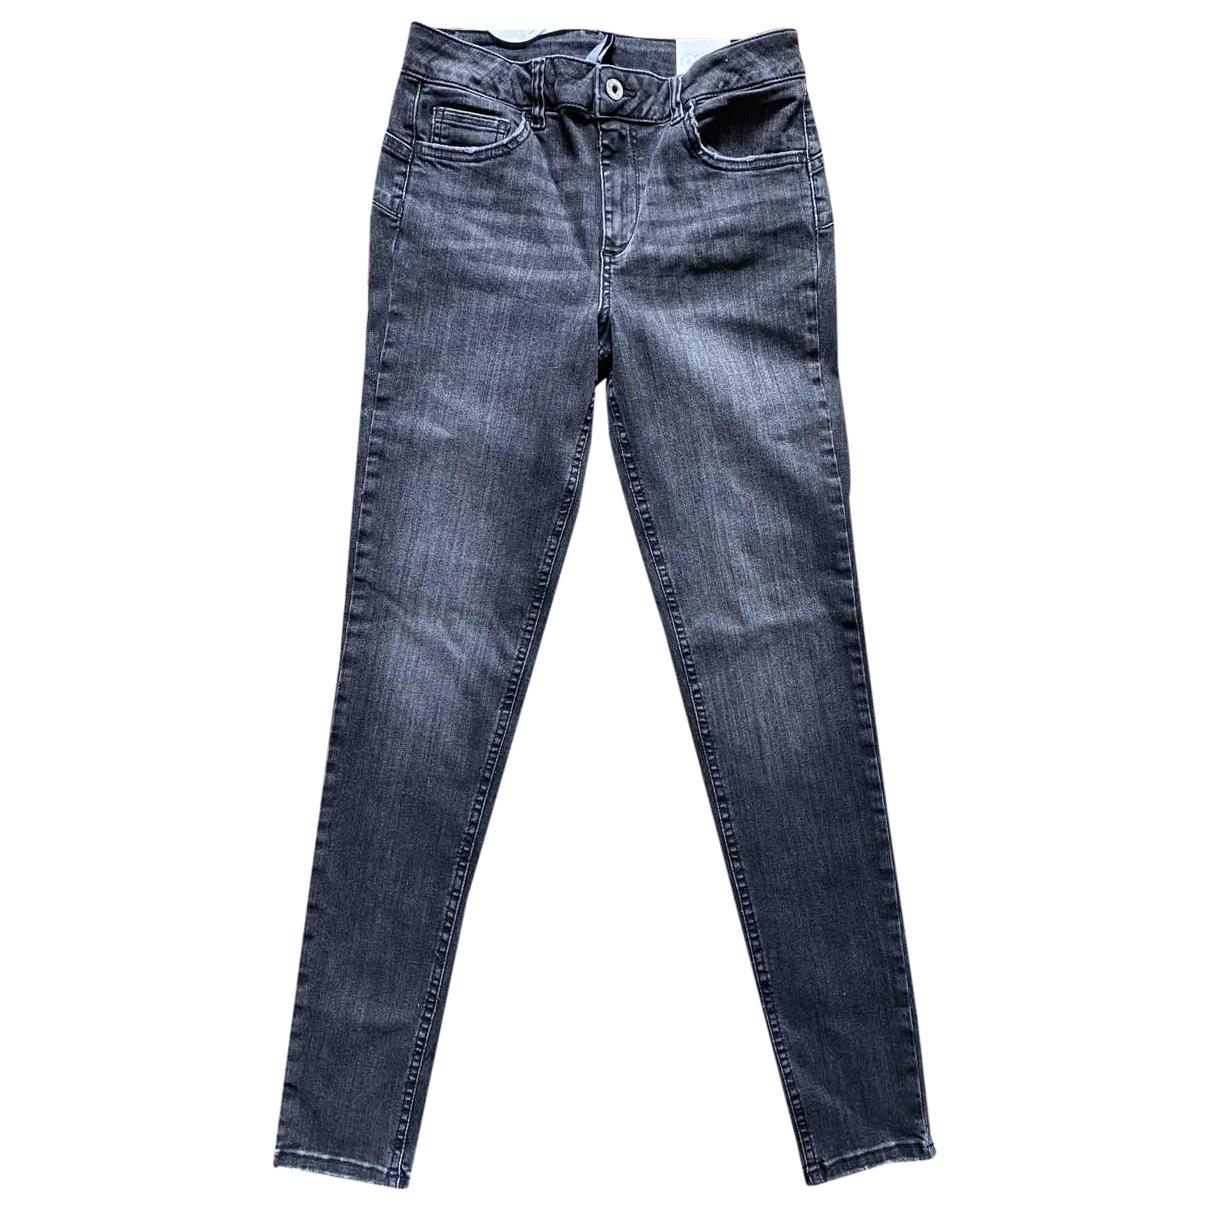 Liu.jo \N Black Cotton - elasthane Jeans for Women 29 US